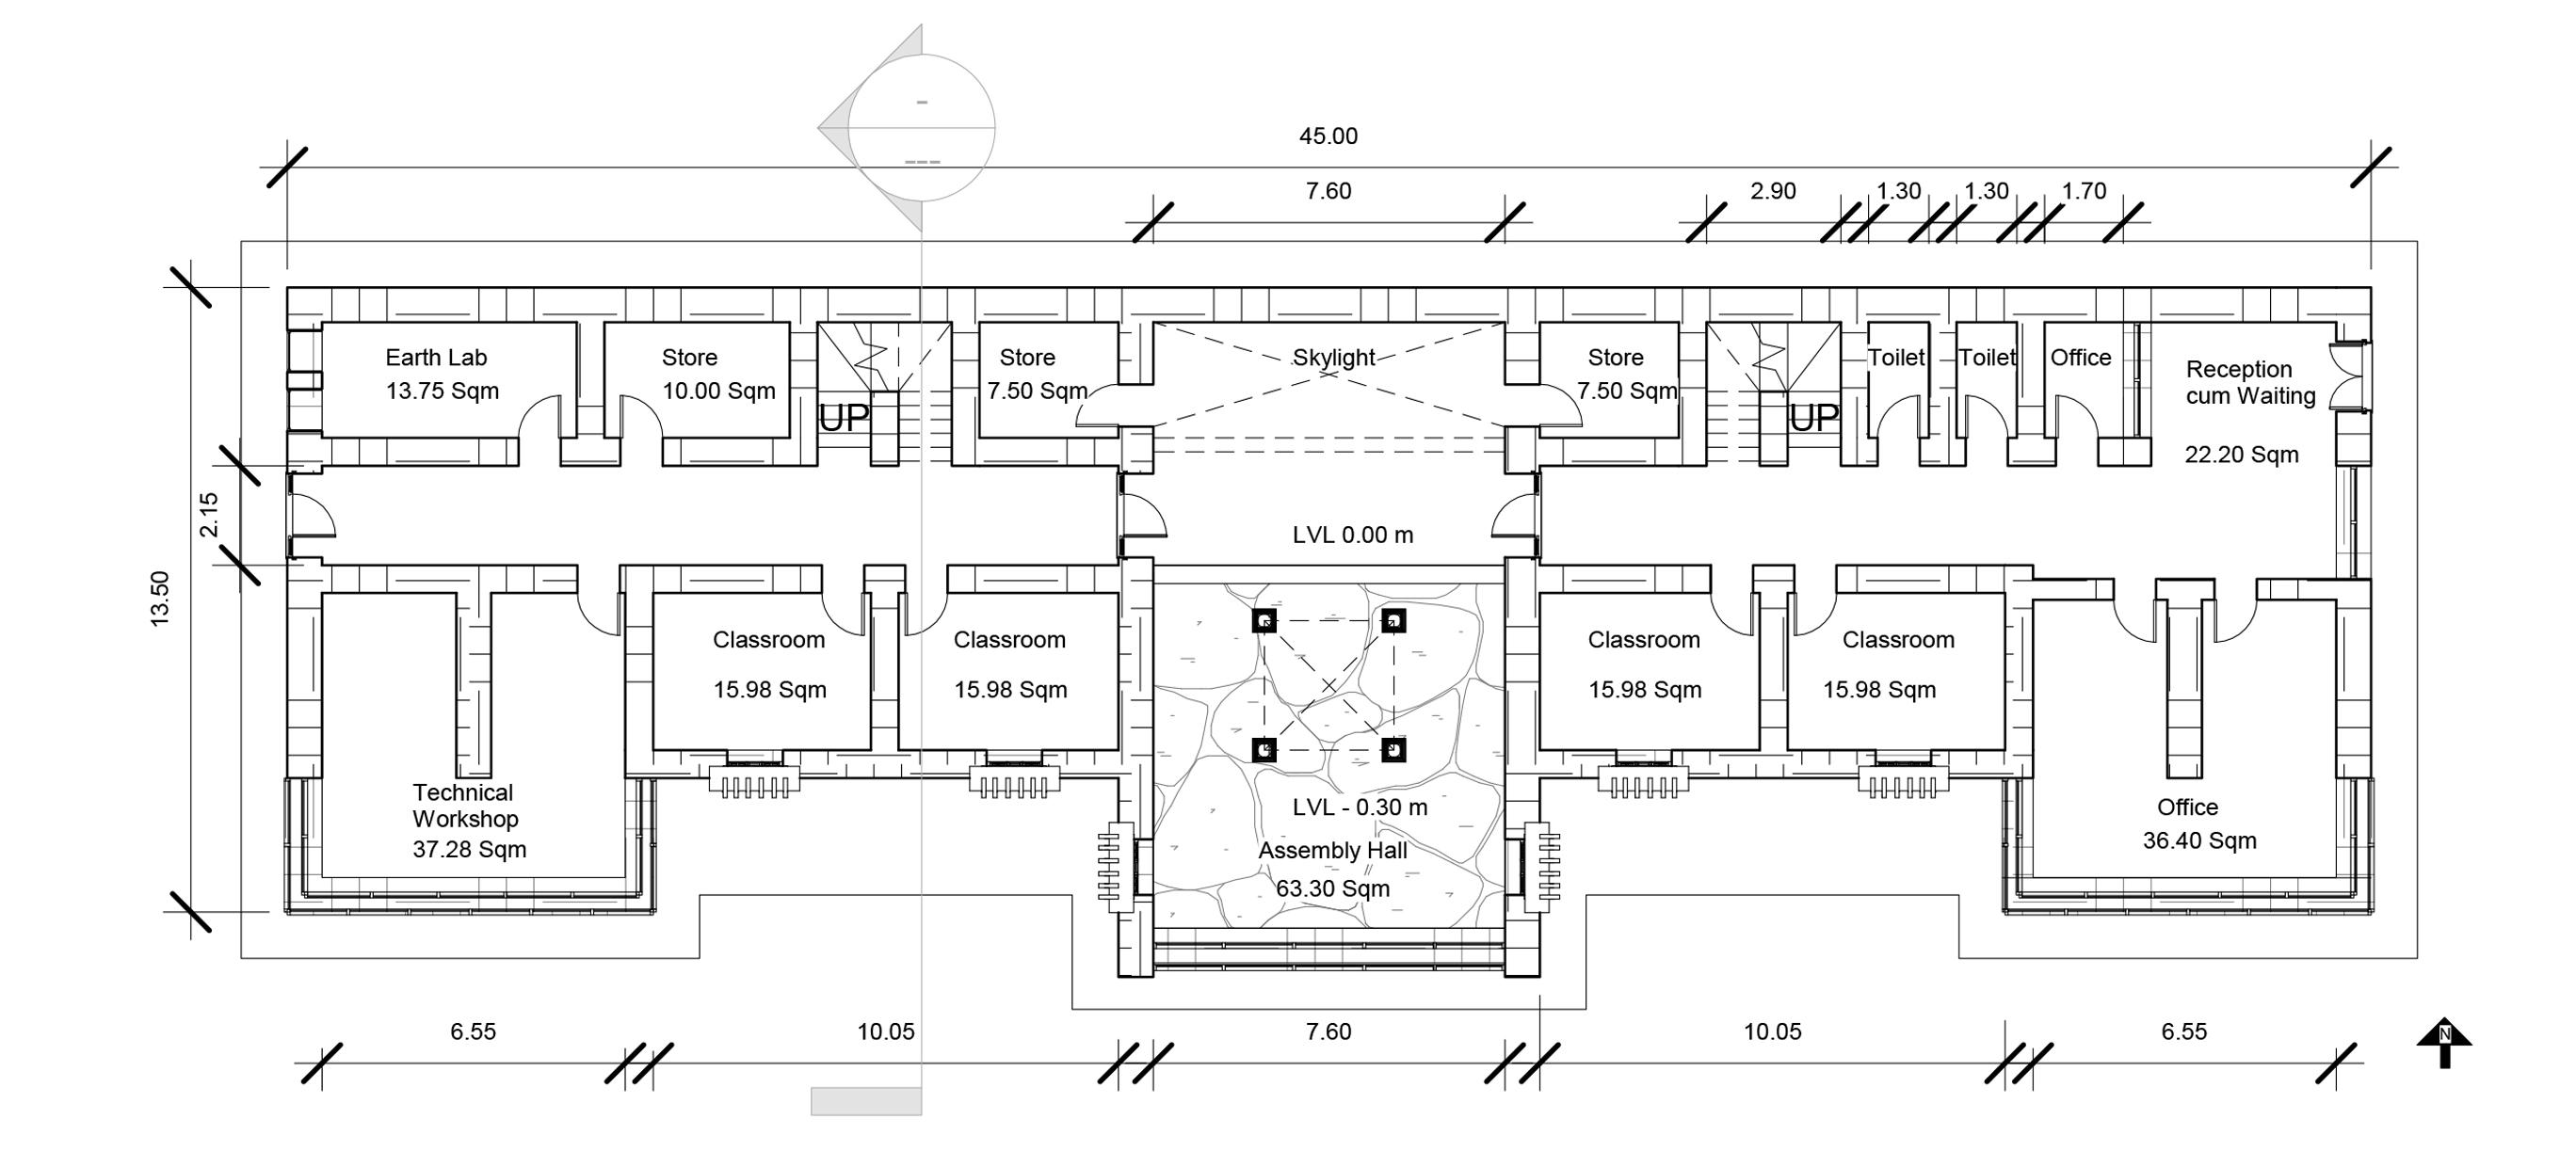 Cusersbharatdesktopsecmolawardsecmol officeplan sheet 346 secmol terra award laureate 1 346 secmol terra award laureate 3